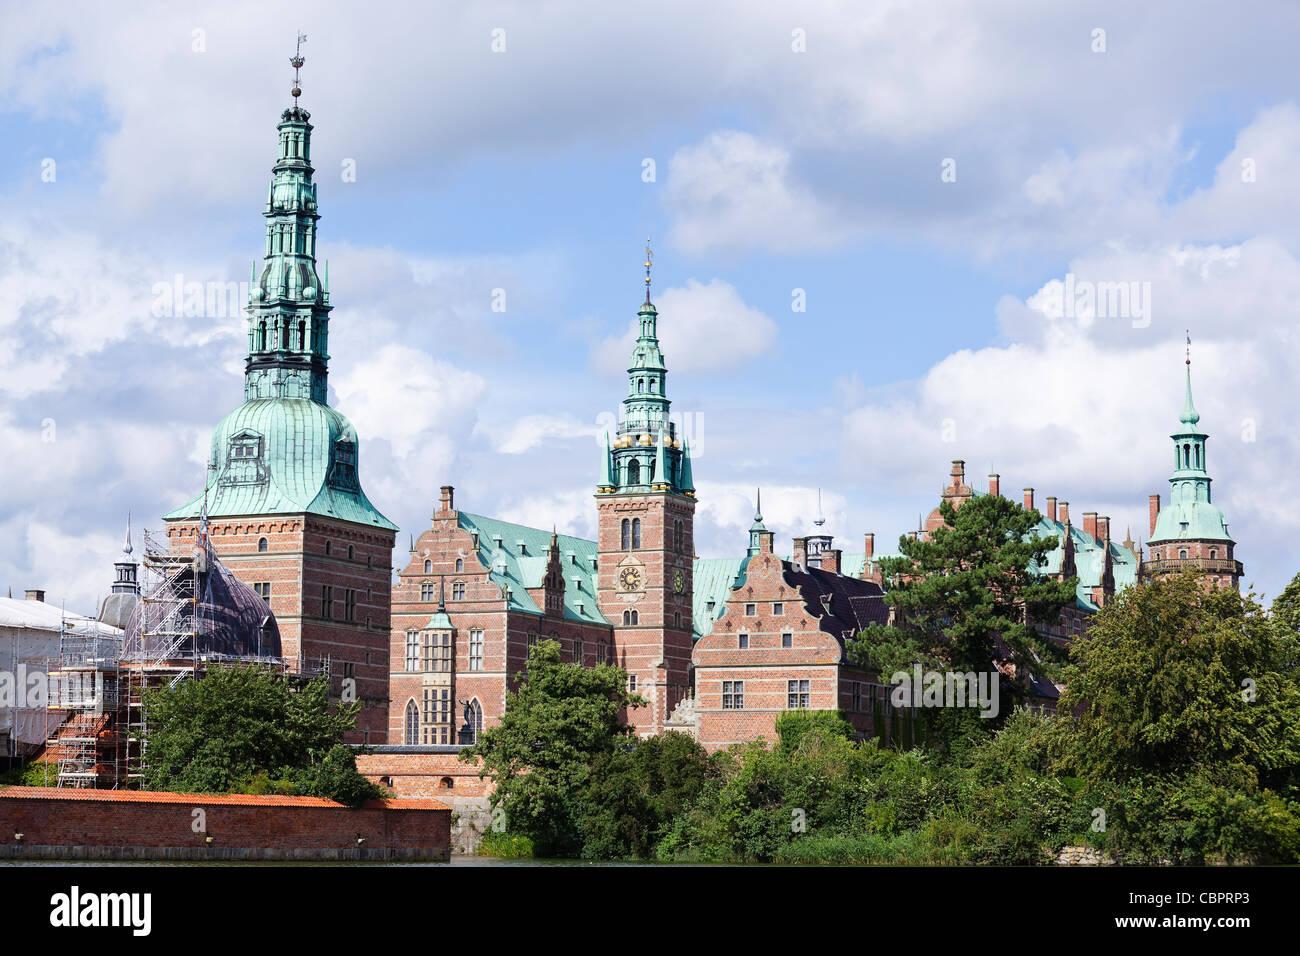 hillerod, denmark: frederiksborg castle - Stock Image